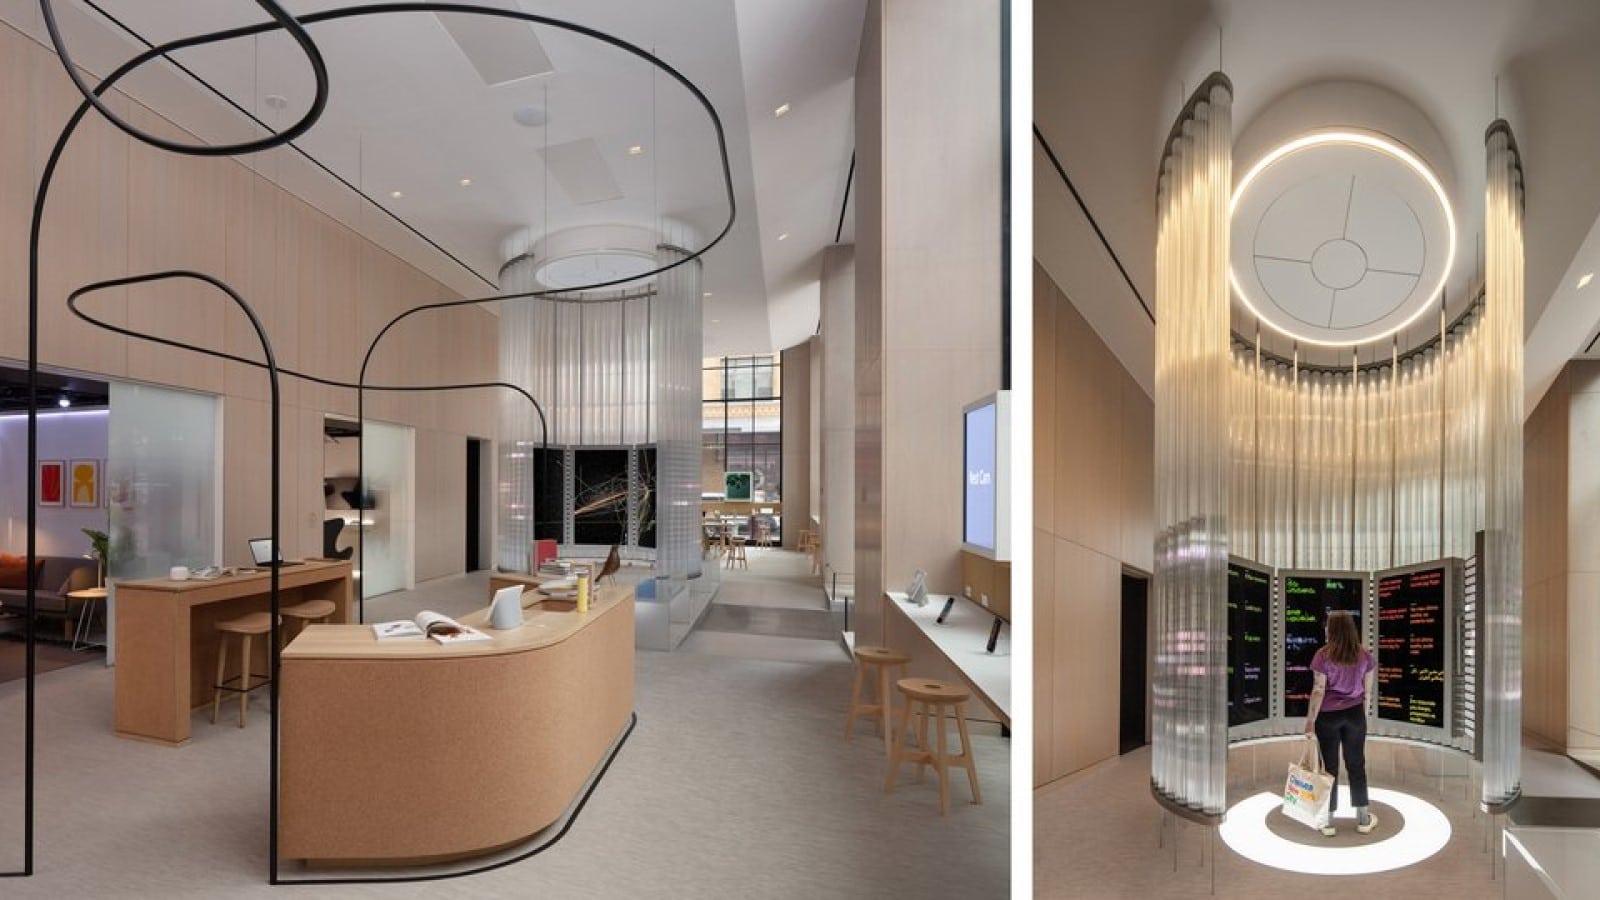 google imagination space inside google store nyc